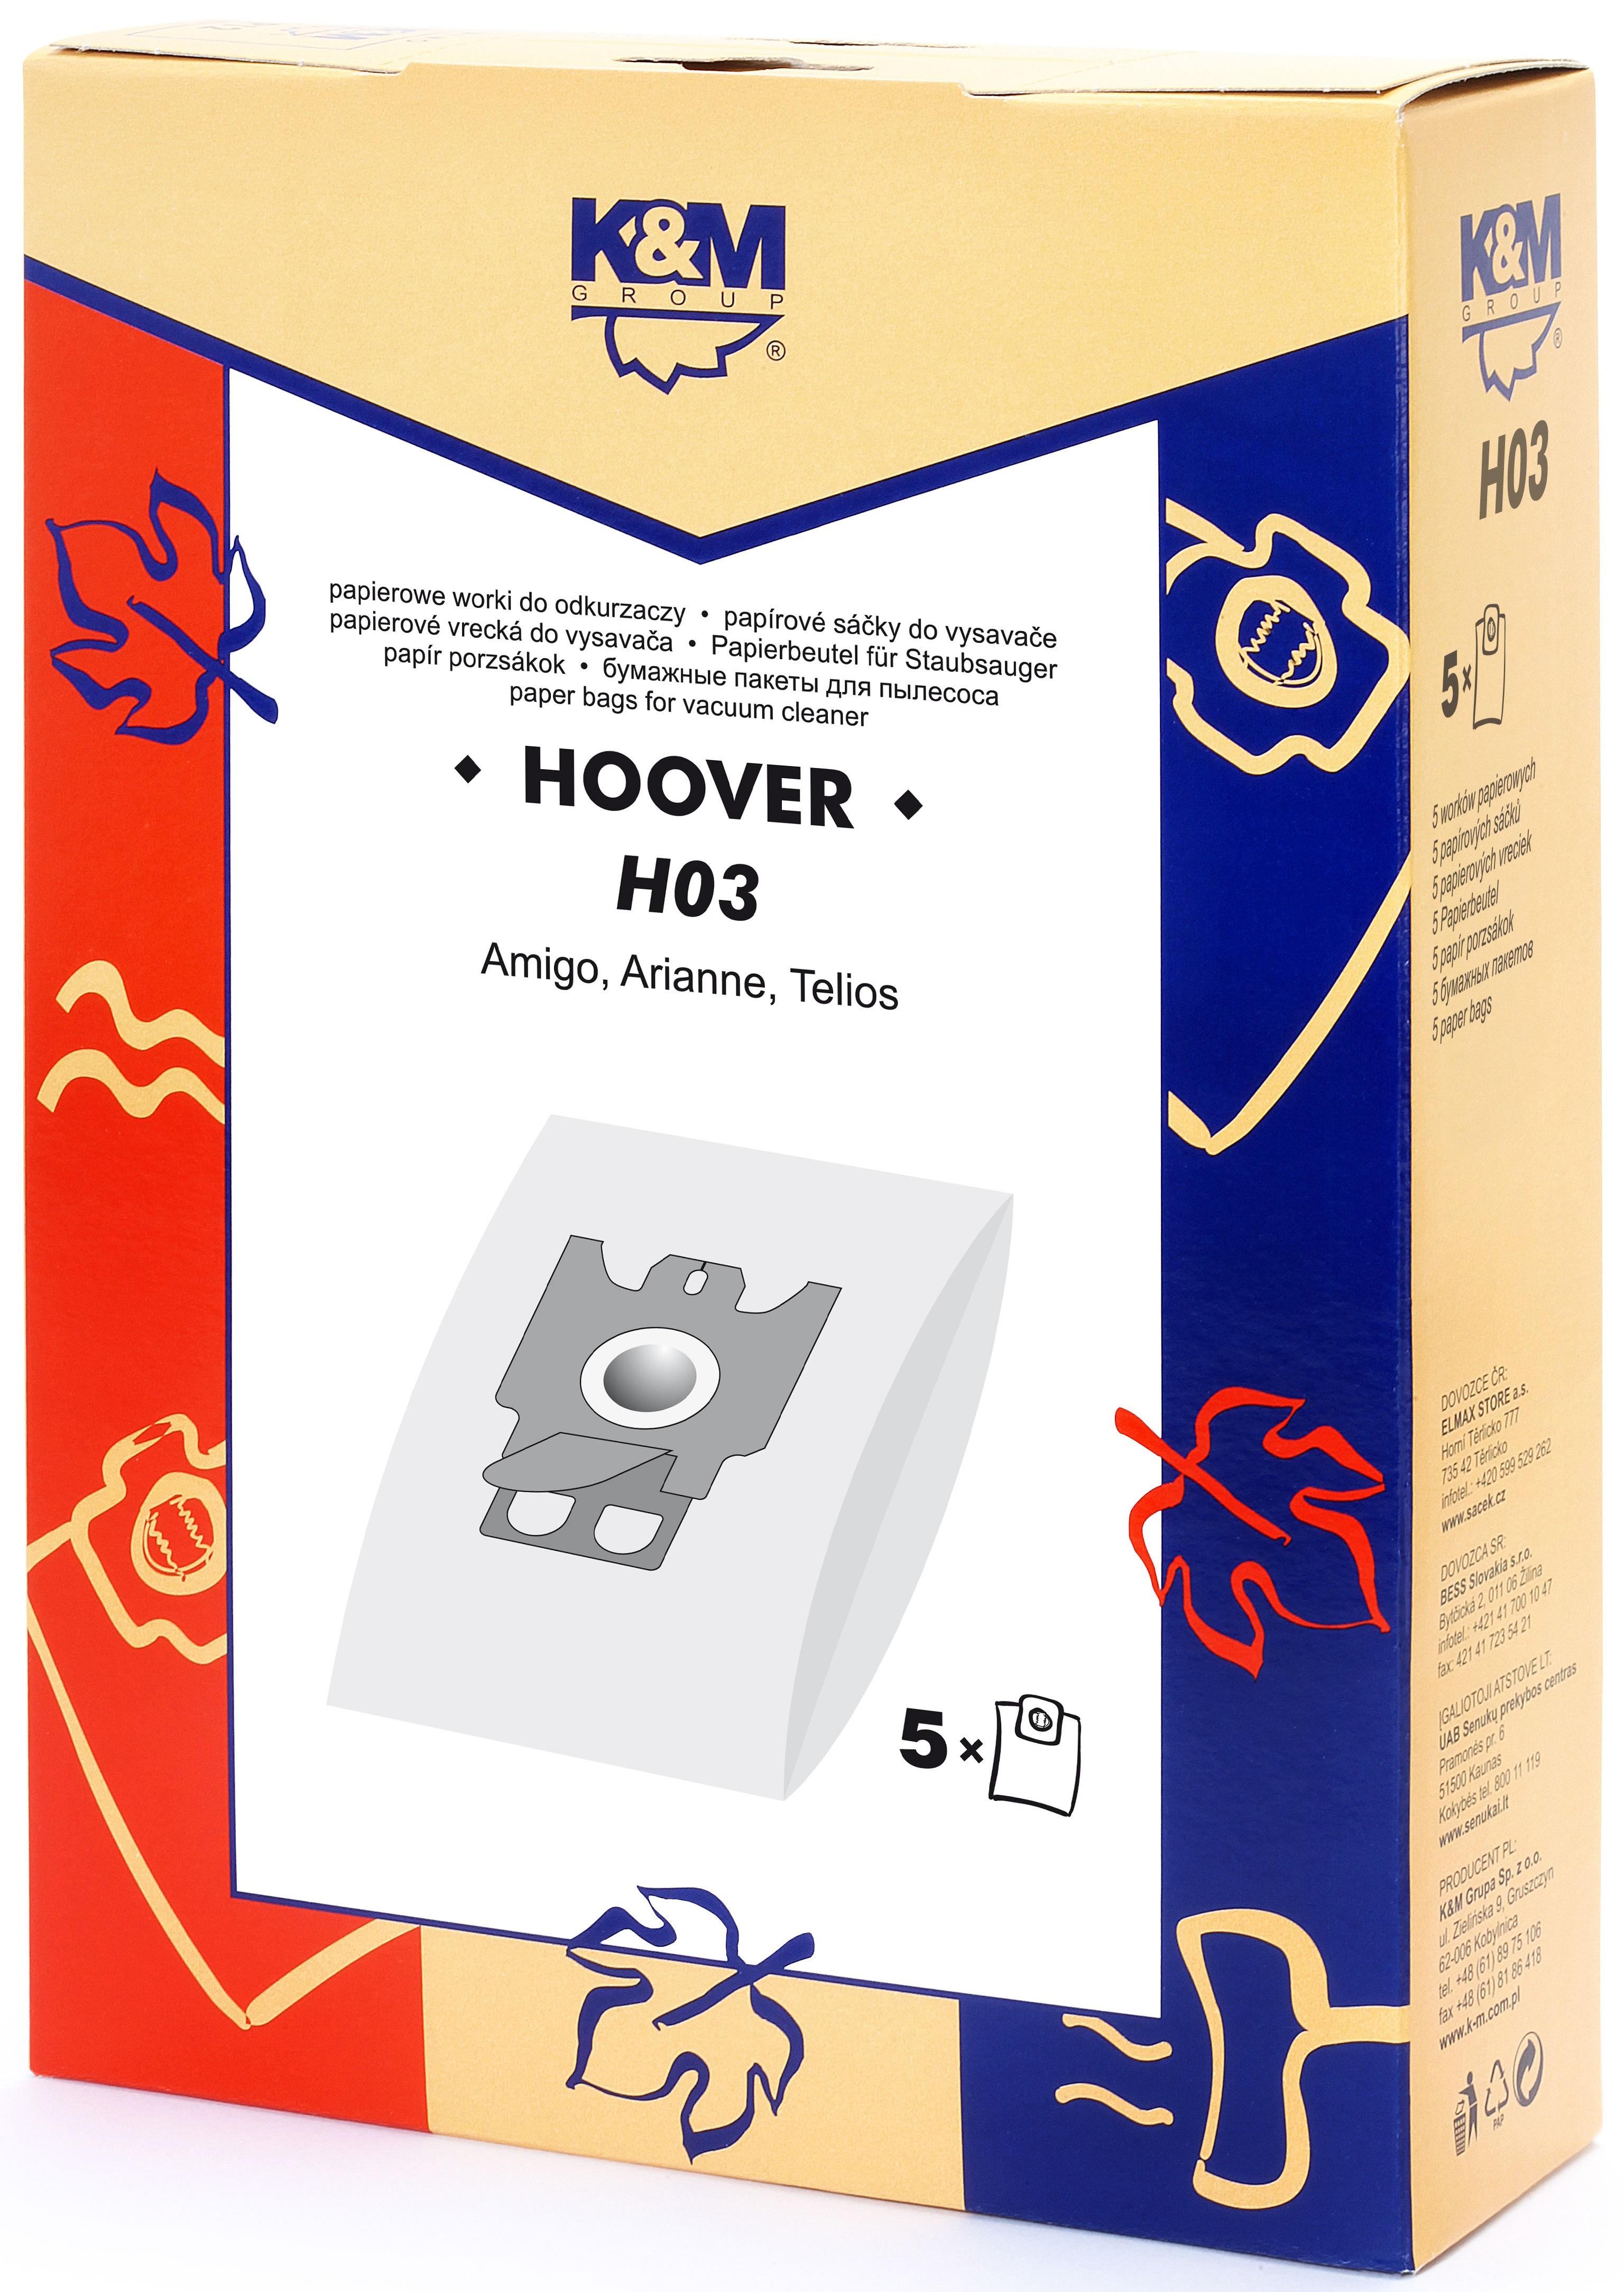 Sac aspirator Hoover H30, hartie, 5X saci, K&M 0